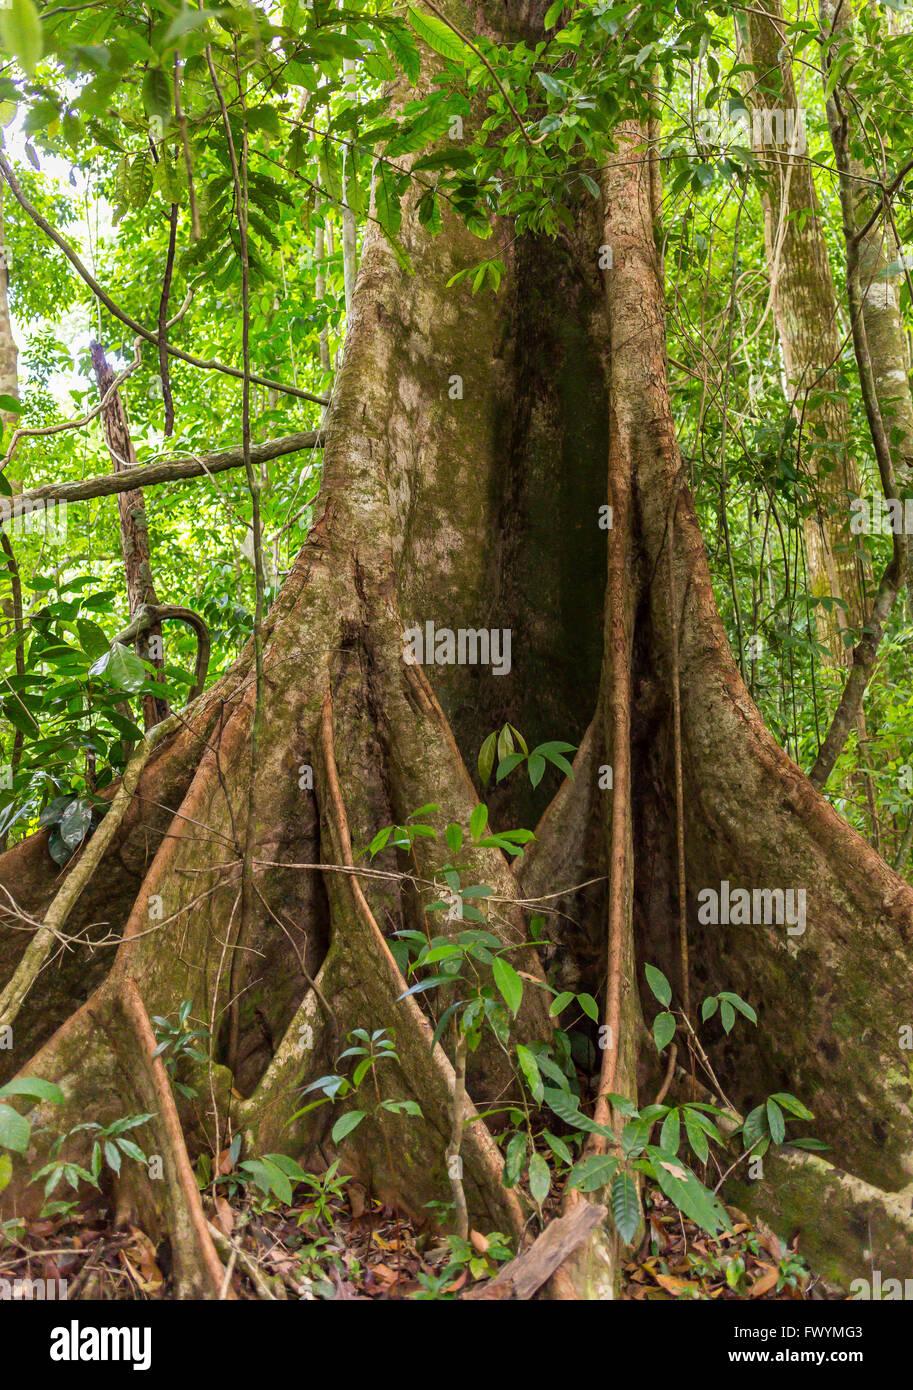 Mahagonibaum im regenwald  Cedro Macho Stockfotos & Cedro Macho Bilder - Alamy